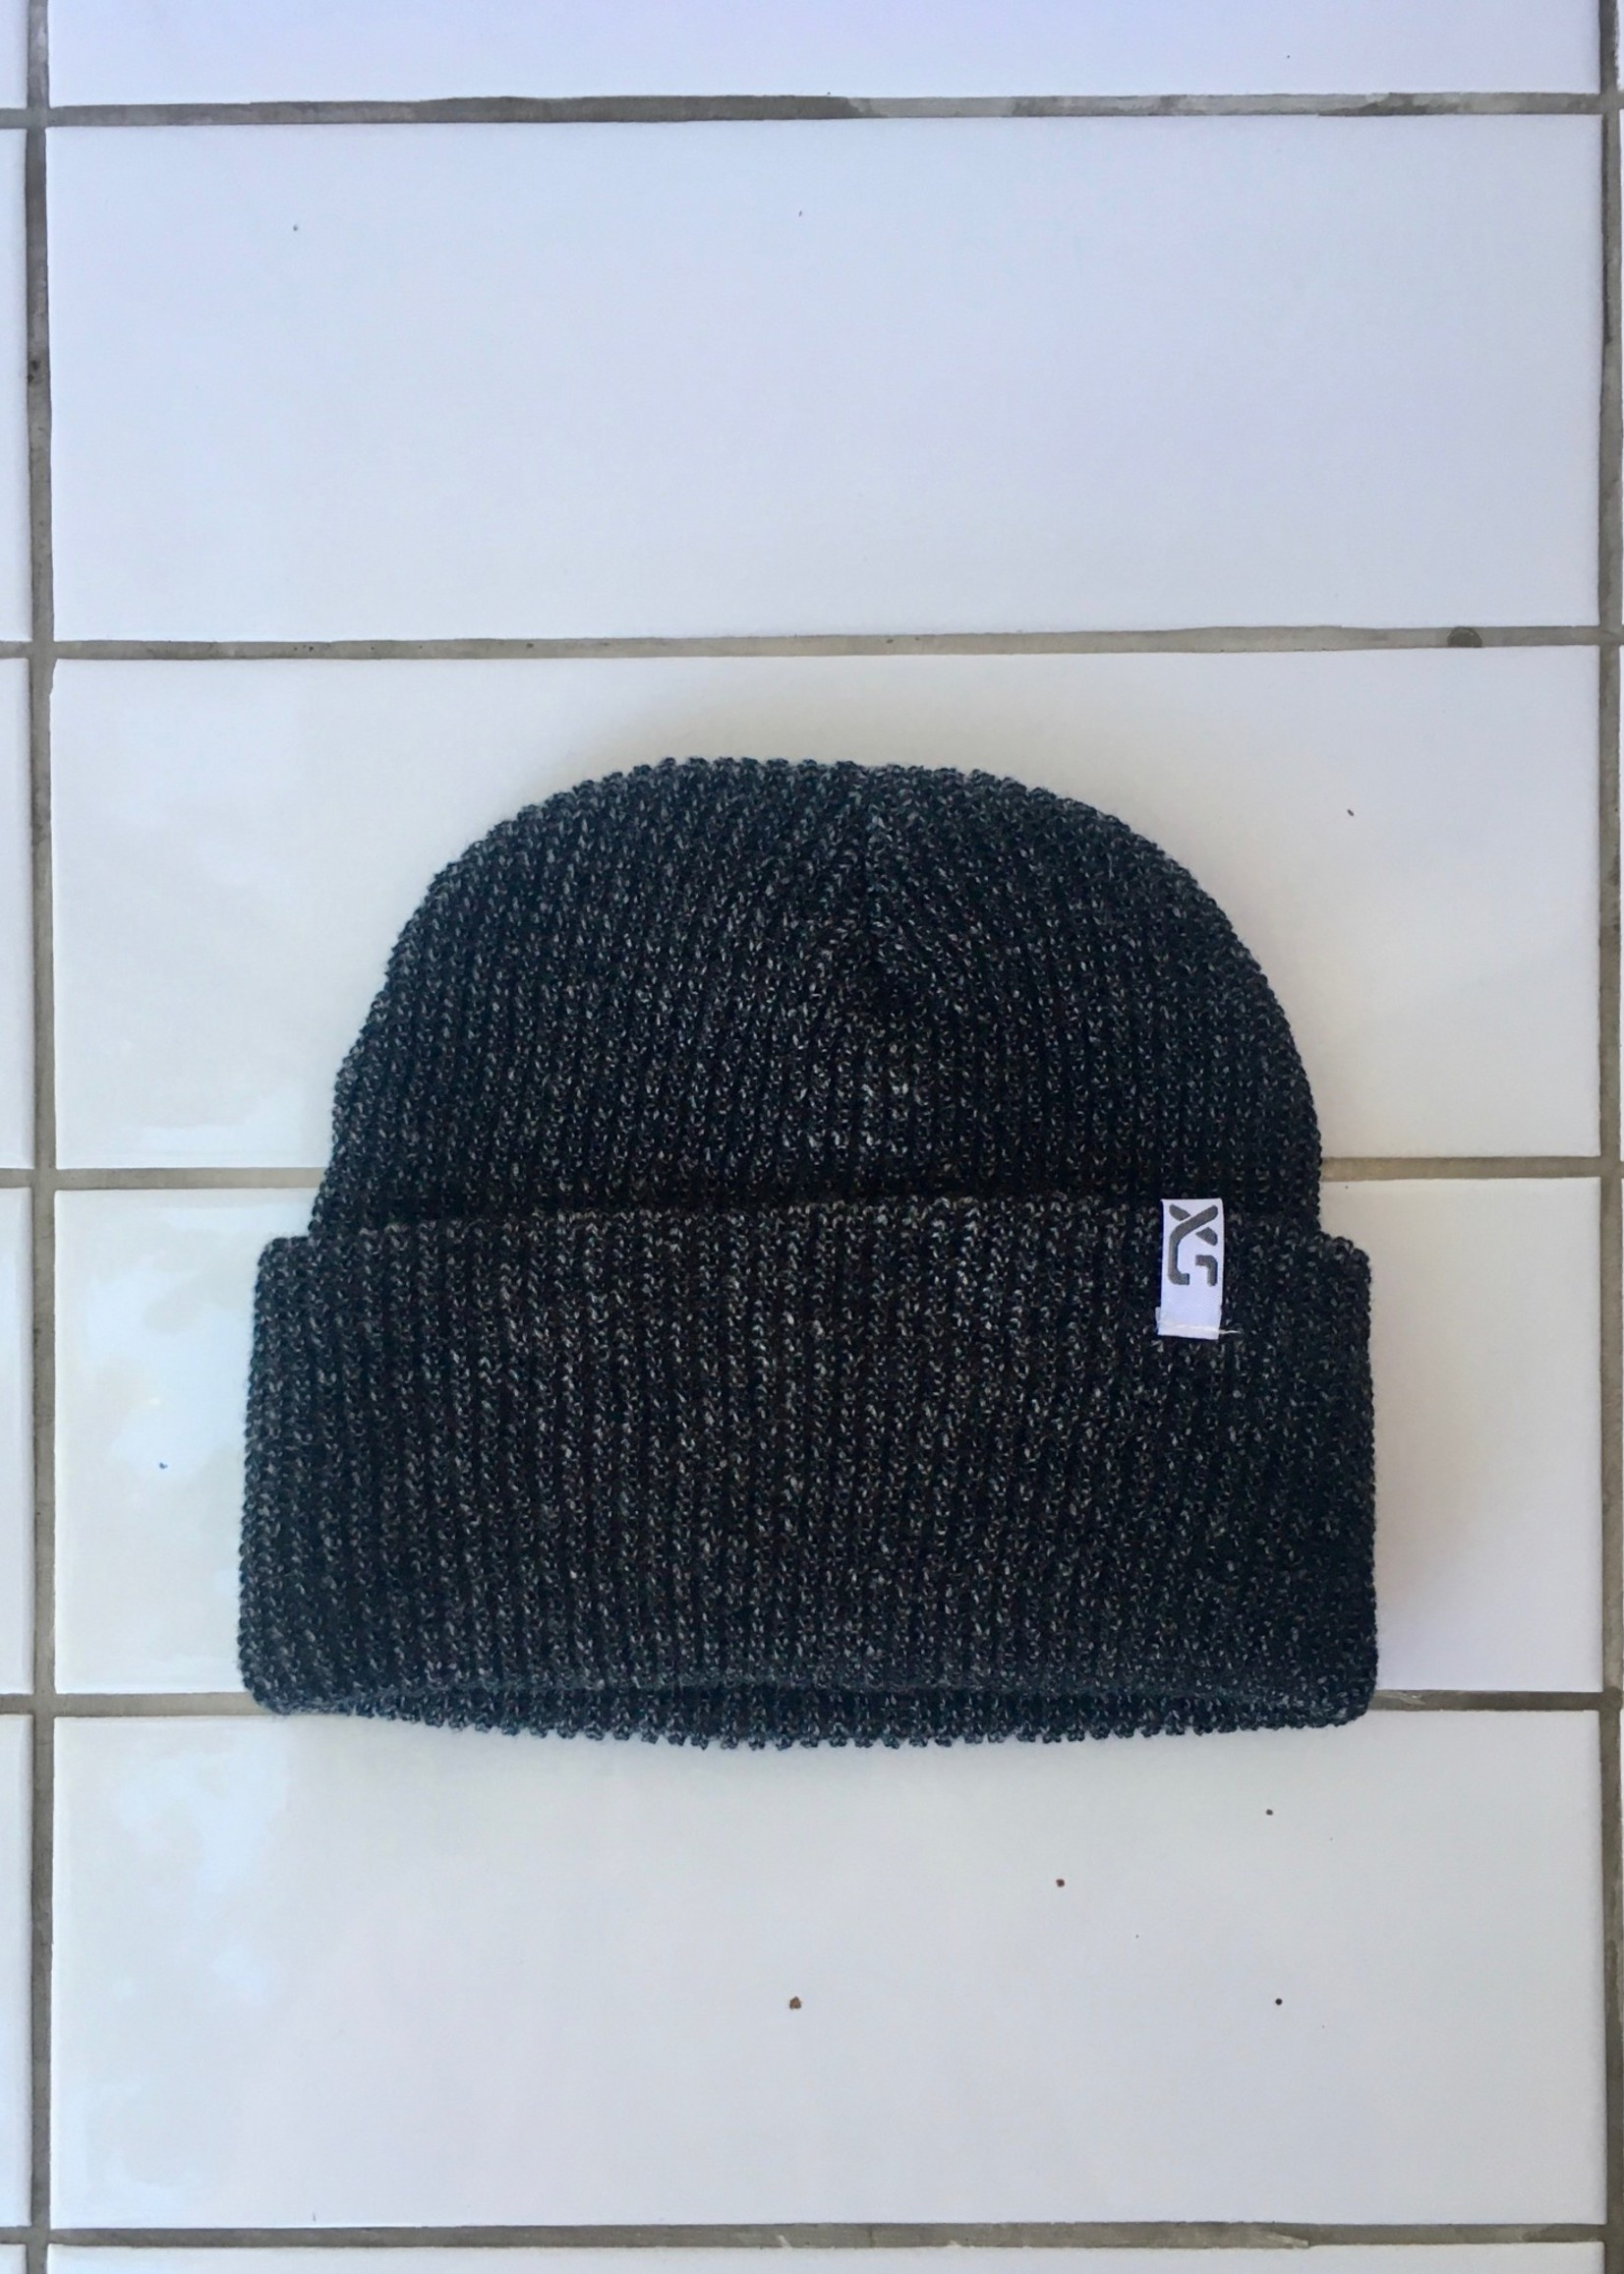 XS Unified Acrylic Knit Beanies